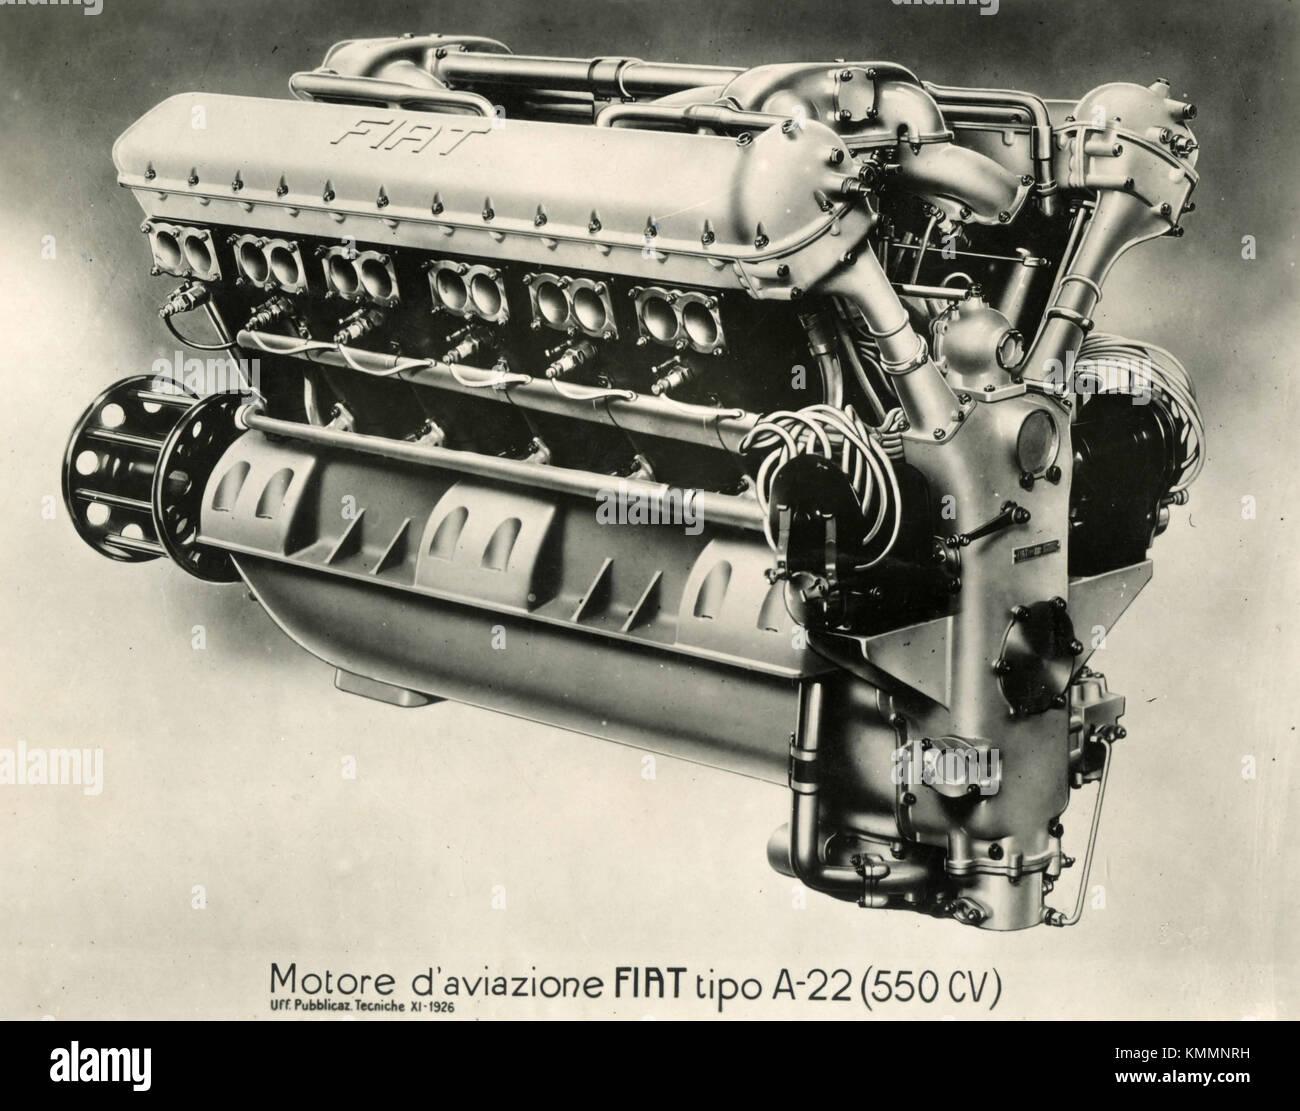 FIAT aviation engine A.22 (550 CV), Italy 1920s - Stock Image